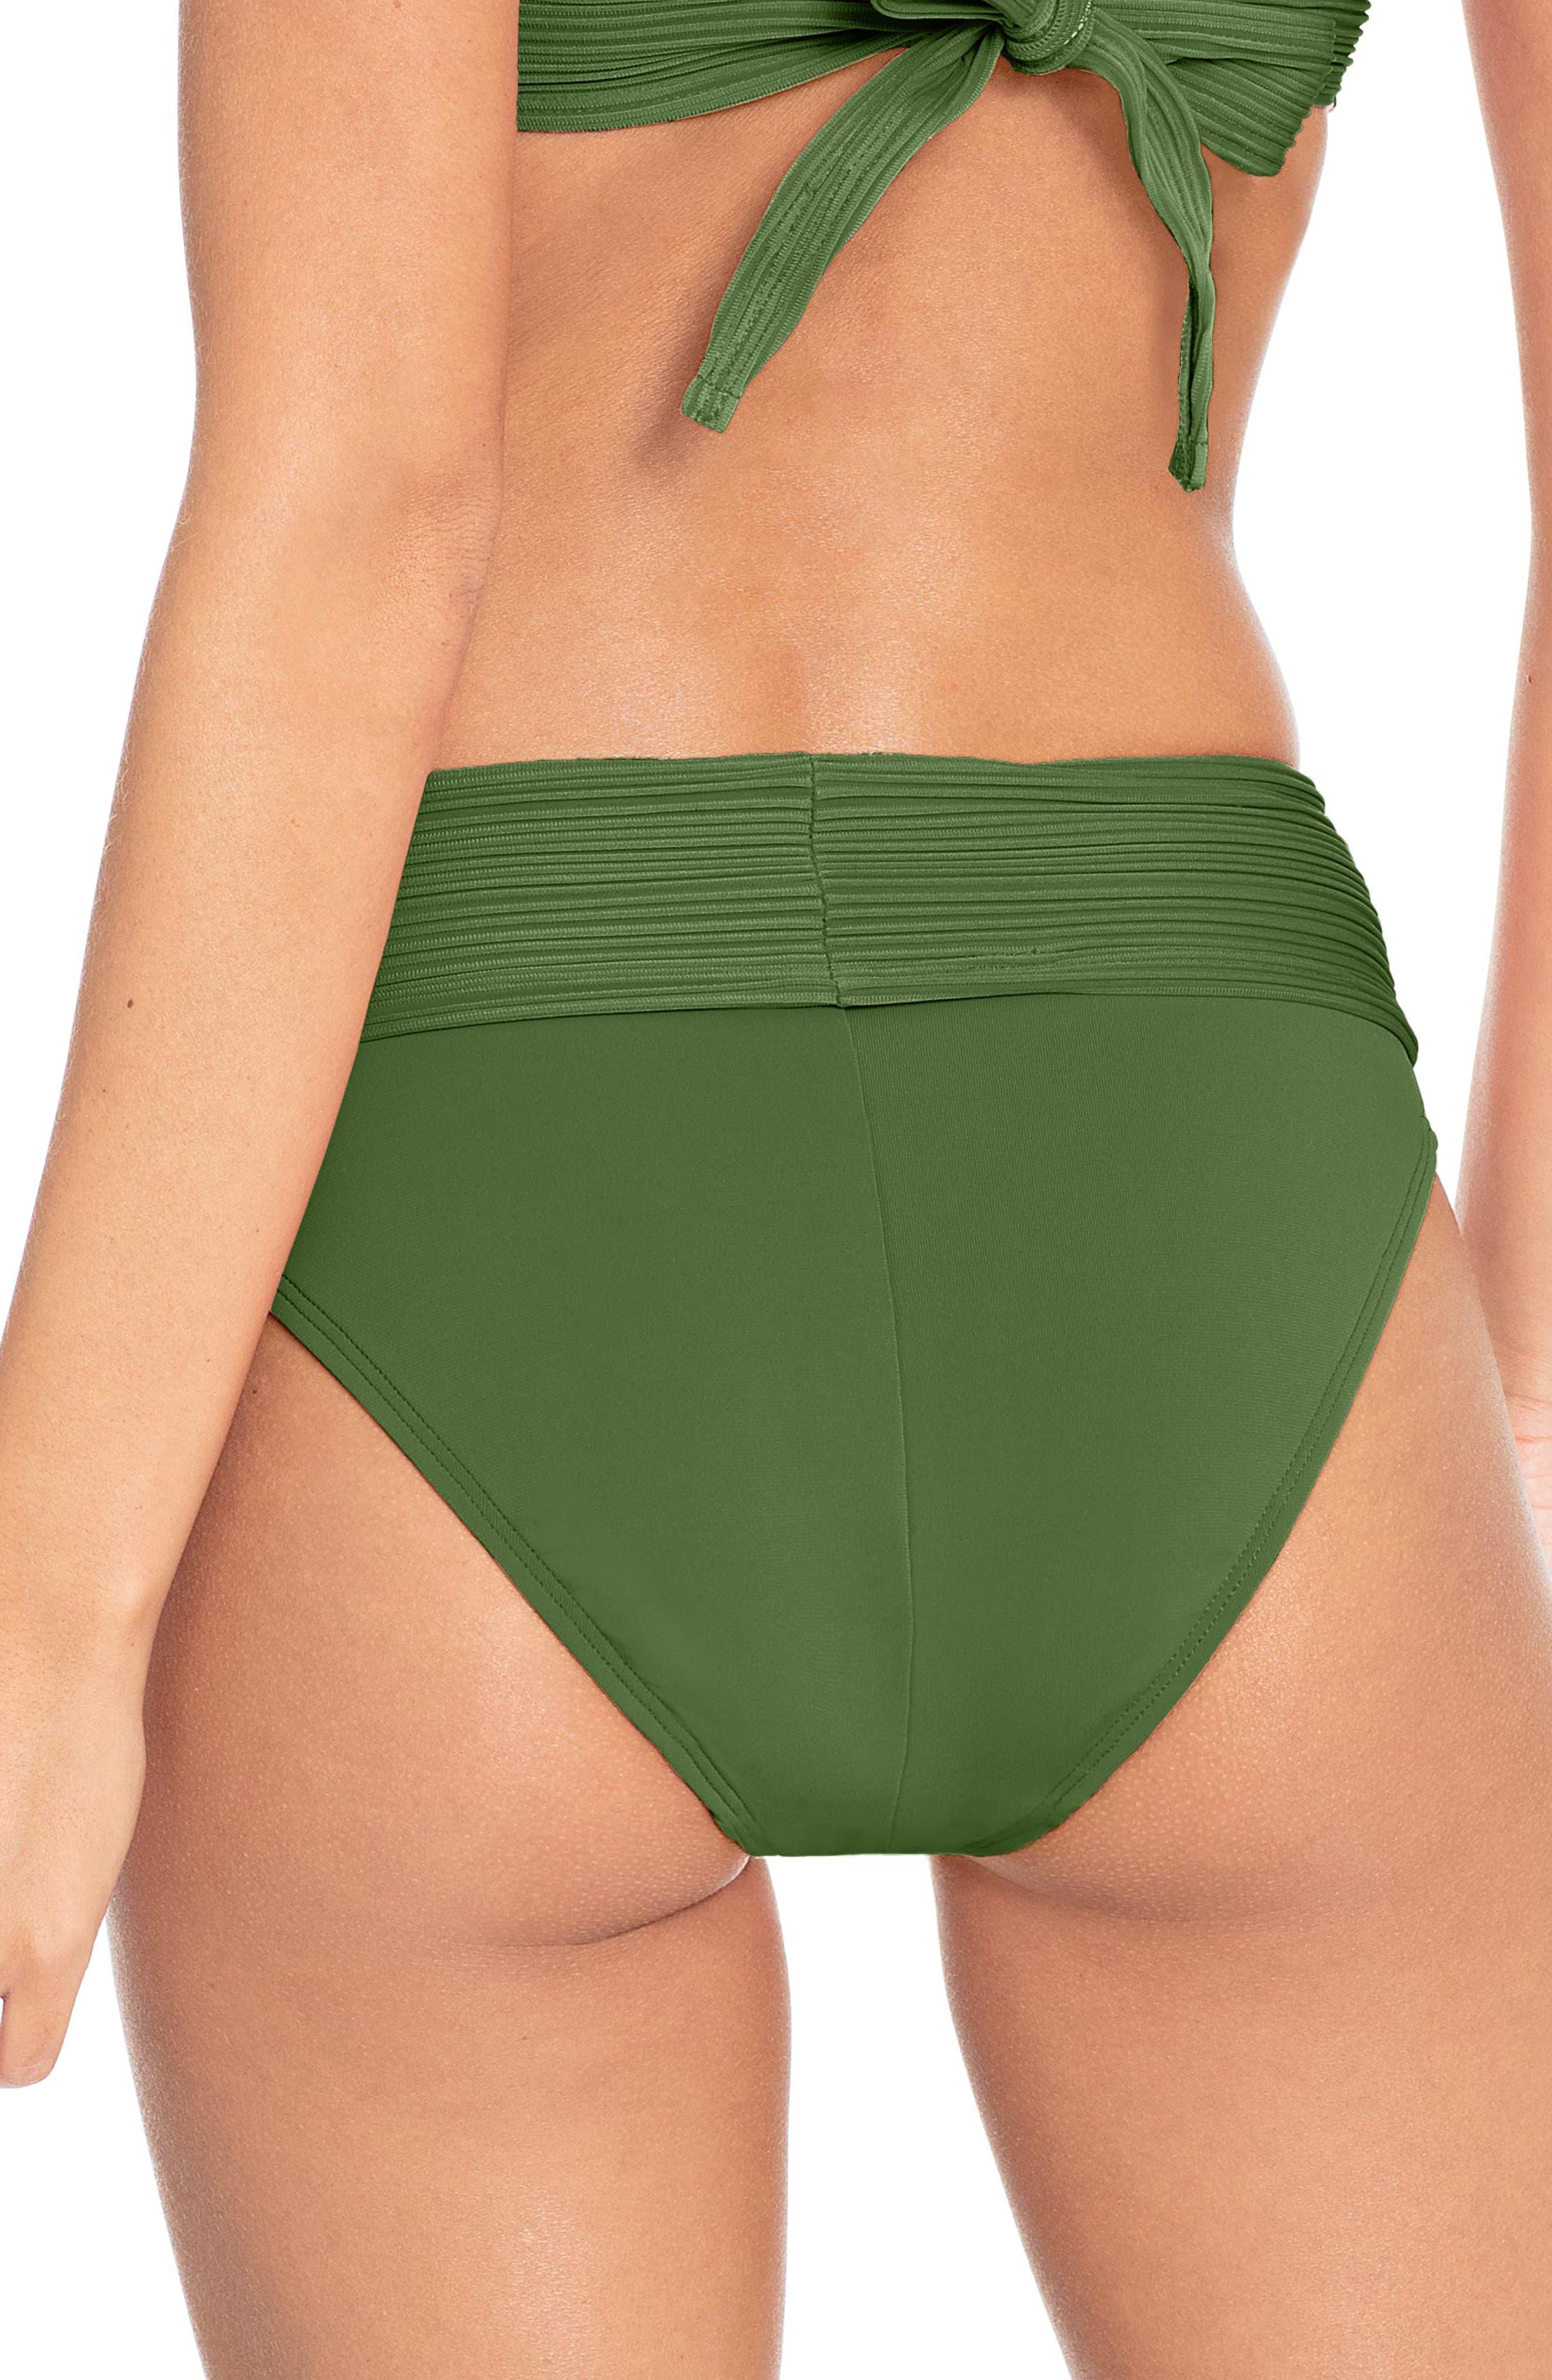 Lily Banded Bikini Bottoms,                             Alternate thumbnail 2, color,                             BASIL